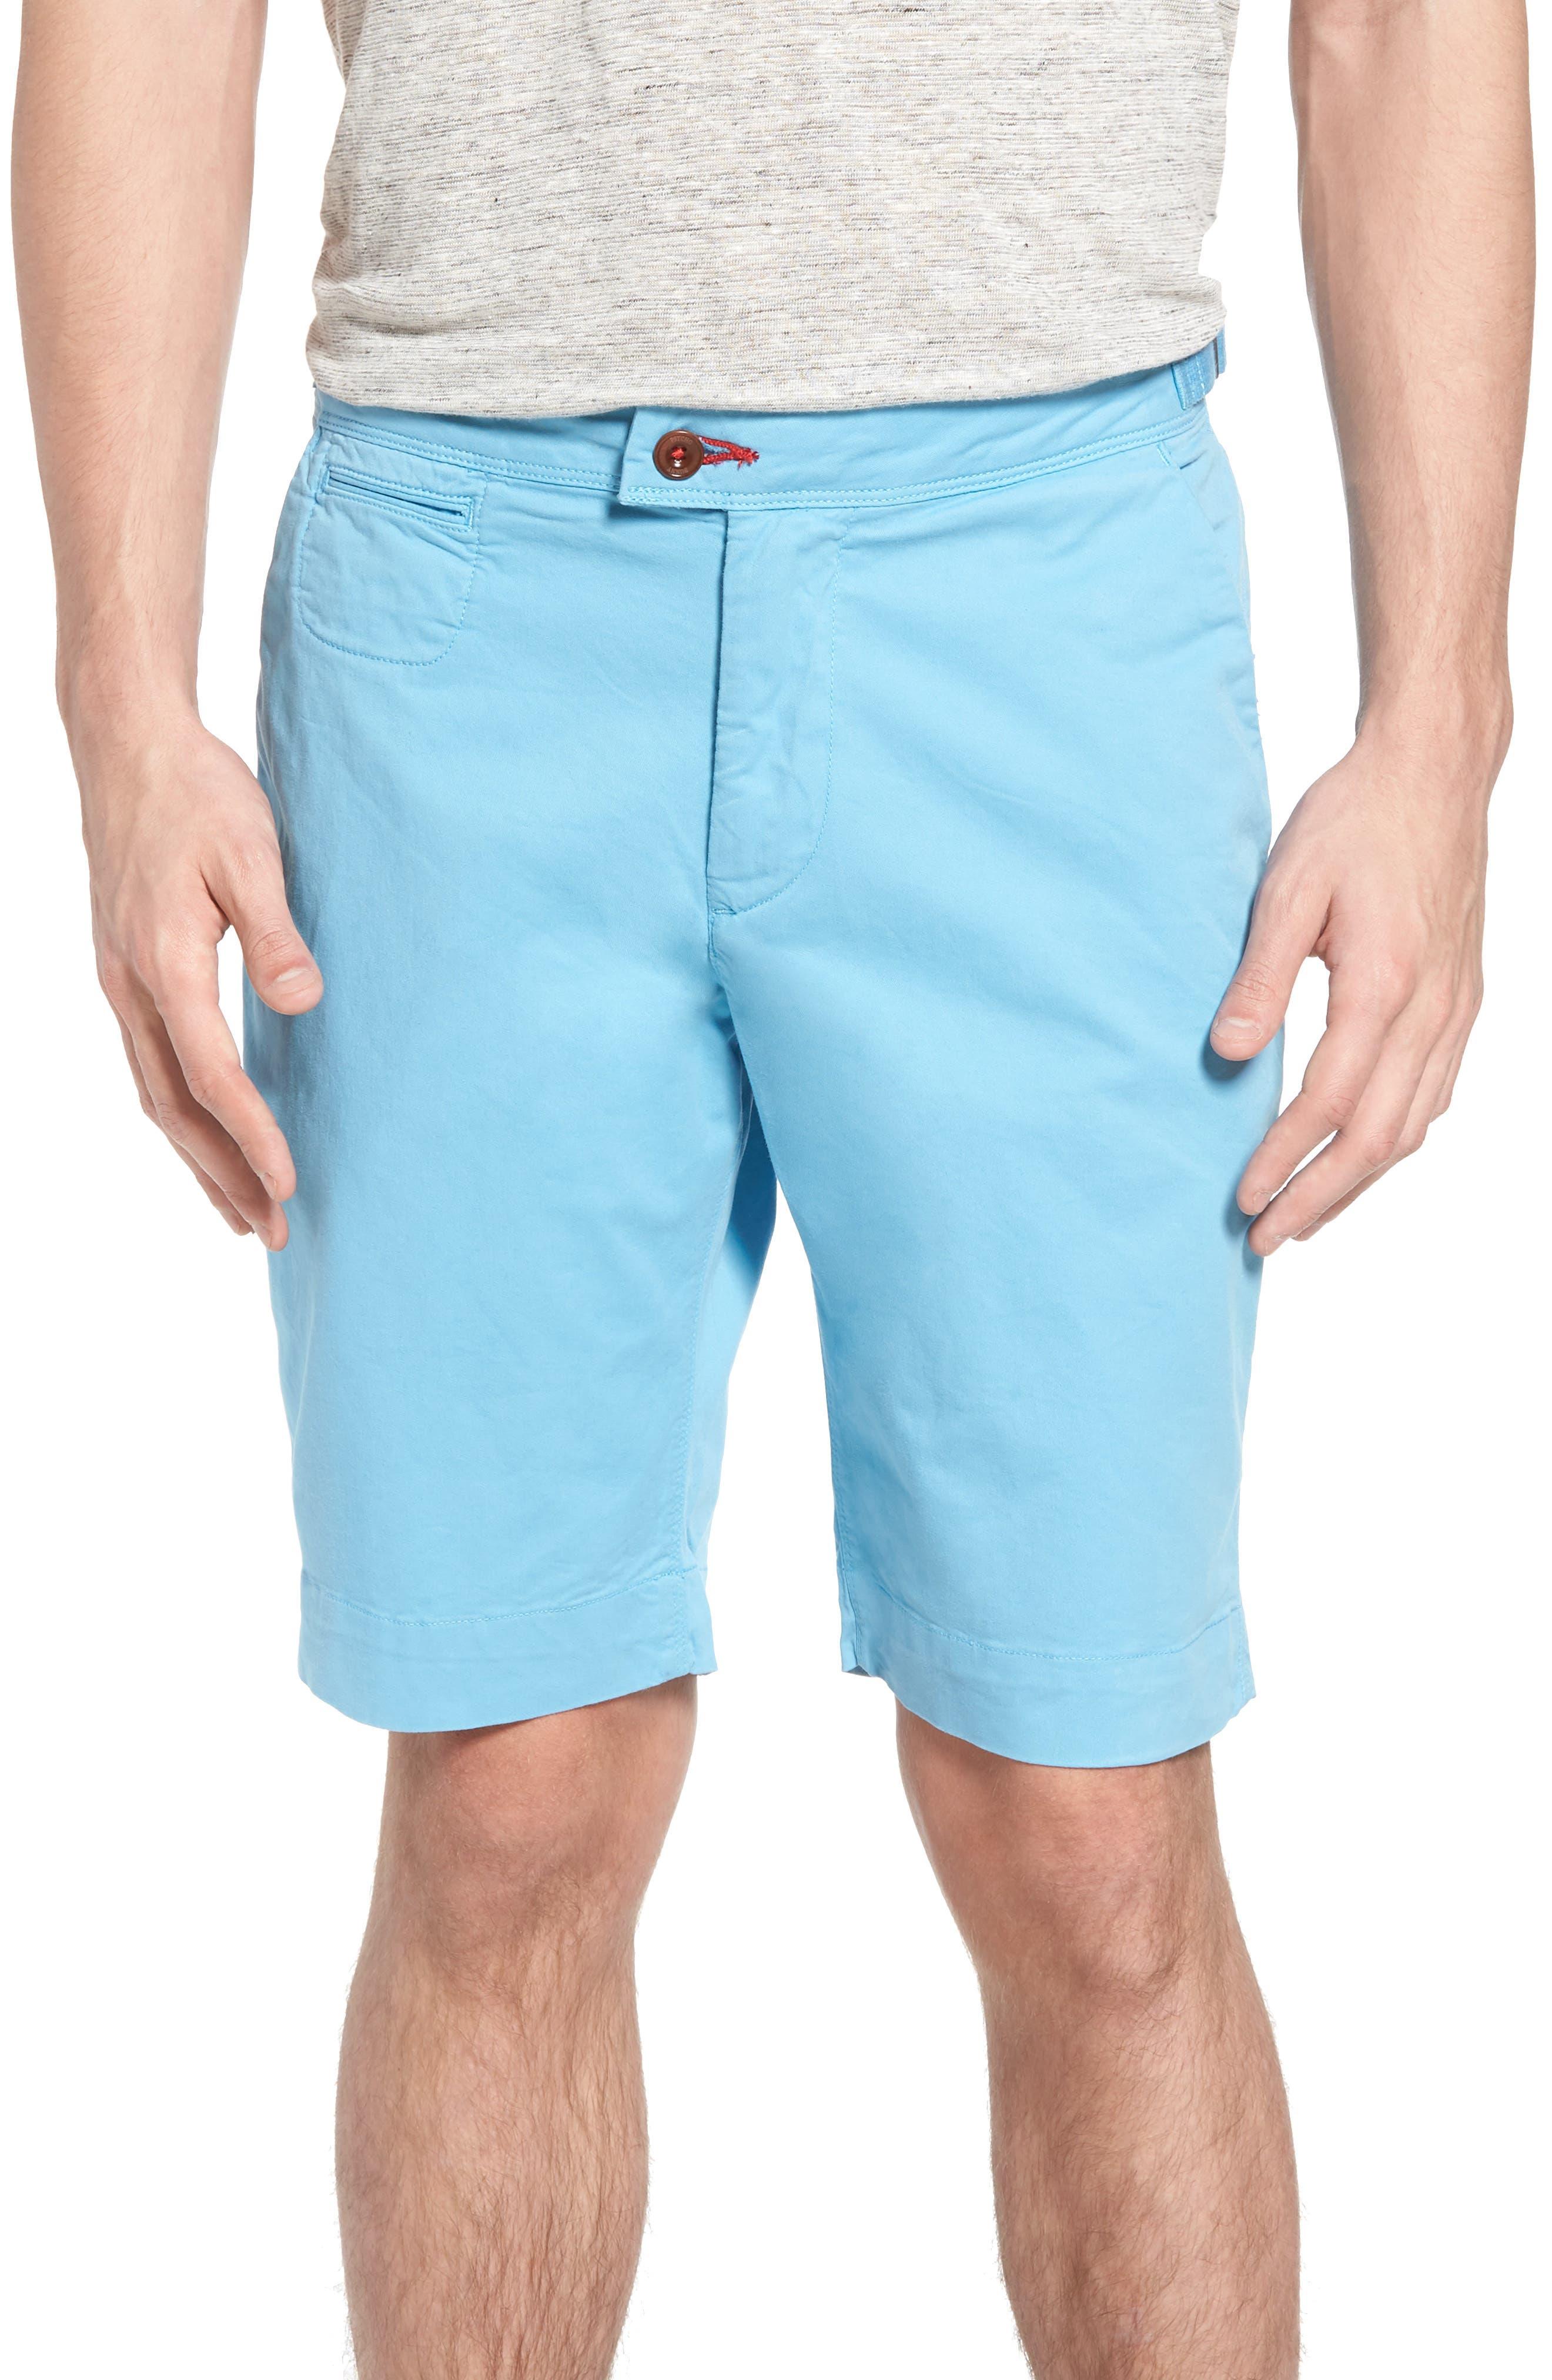 Triumph Shorts,                             Main thumbnail 5, color,